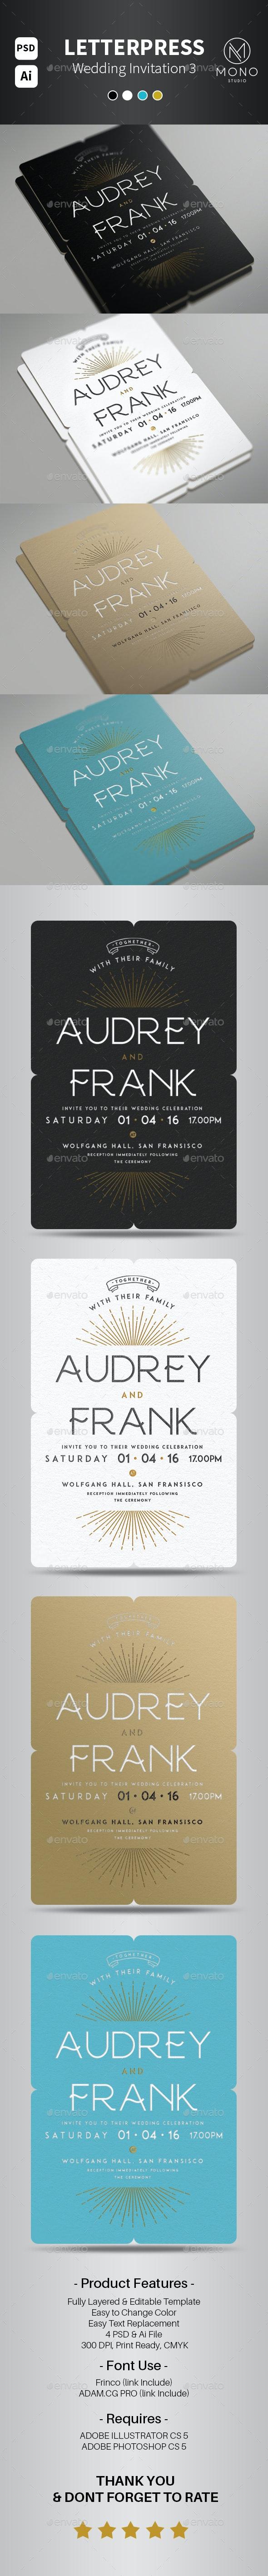 Letterpress Wedding Invitation Set 3 - Invitations Cards & Invites